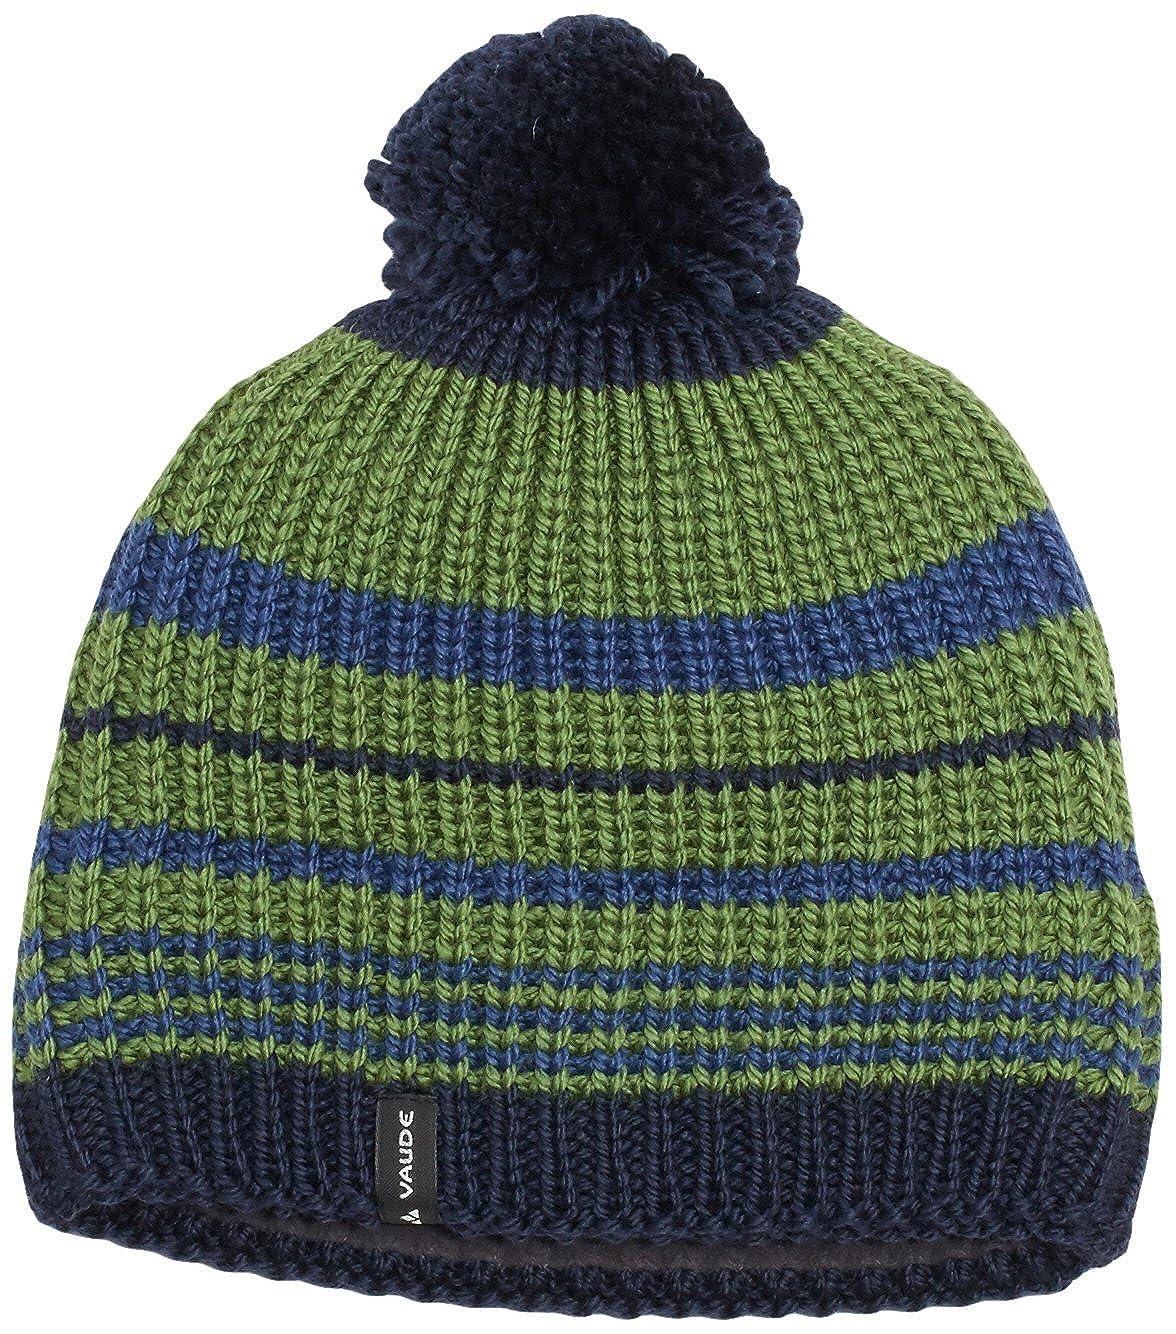 VAUDE Suricate Beanie Cappello Invernale per Bambino